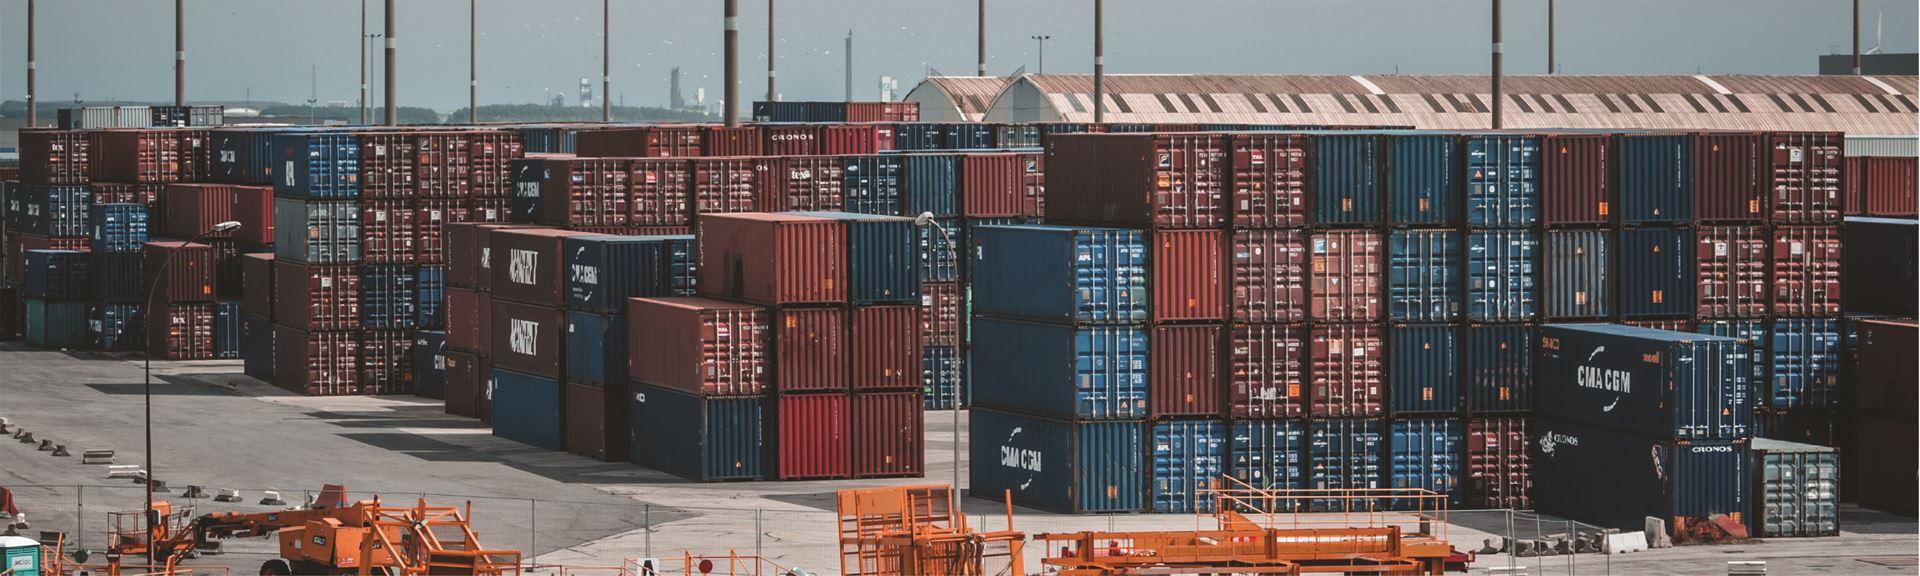 cargo services pakistan